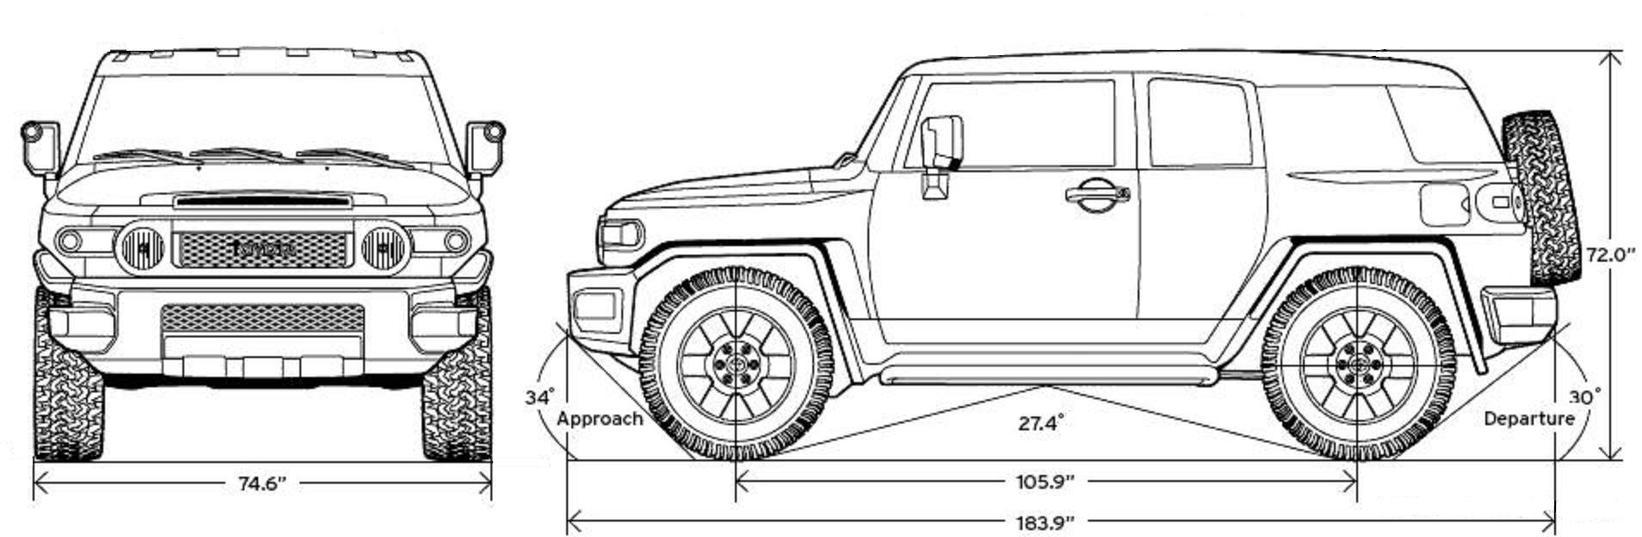 Toyota FJ Cruiser blueprint